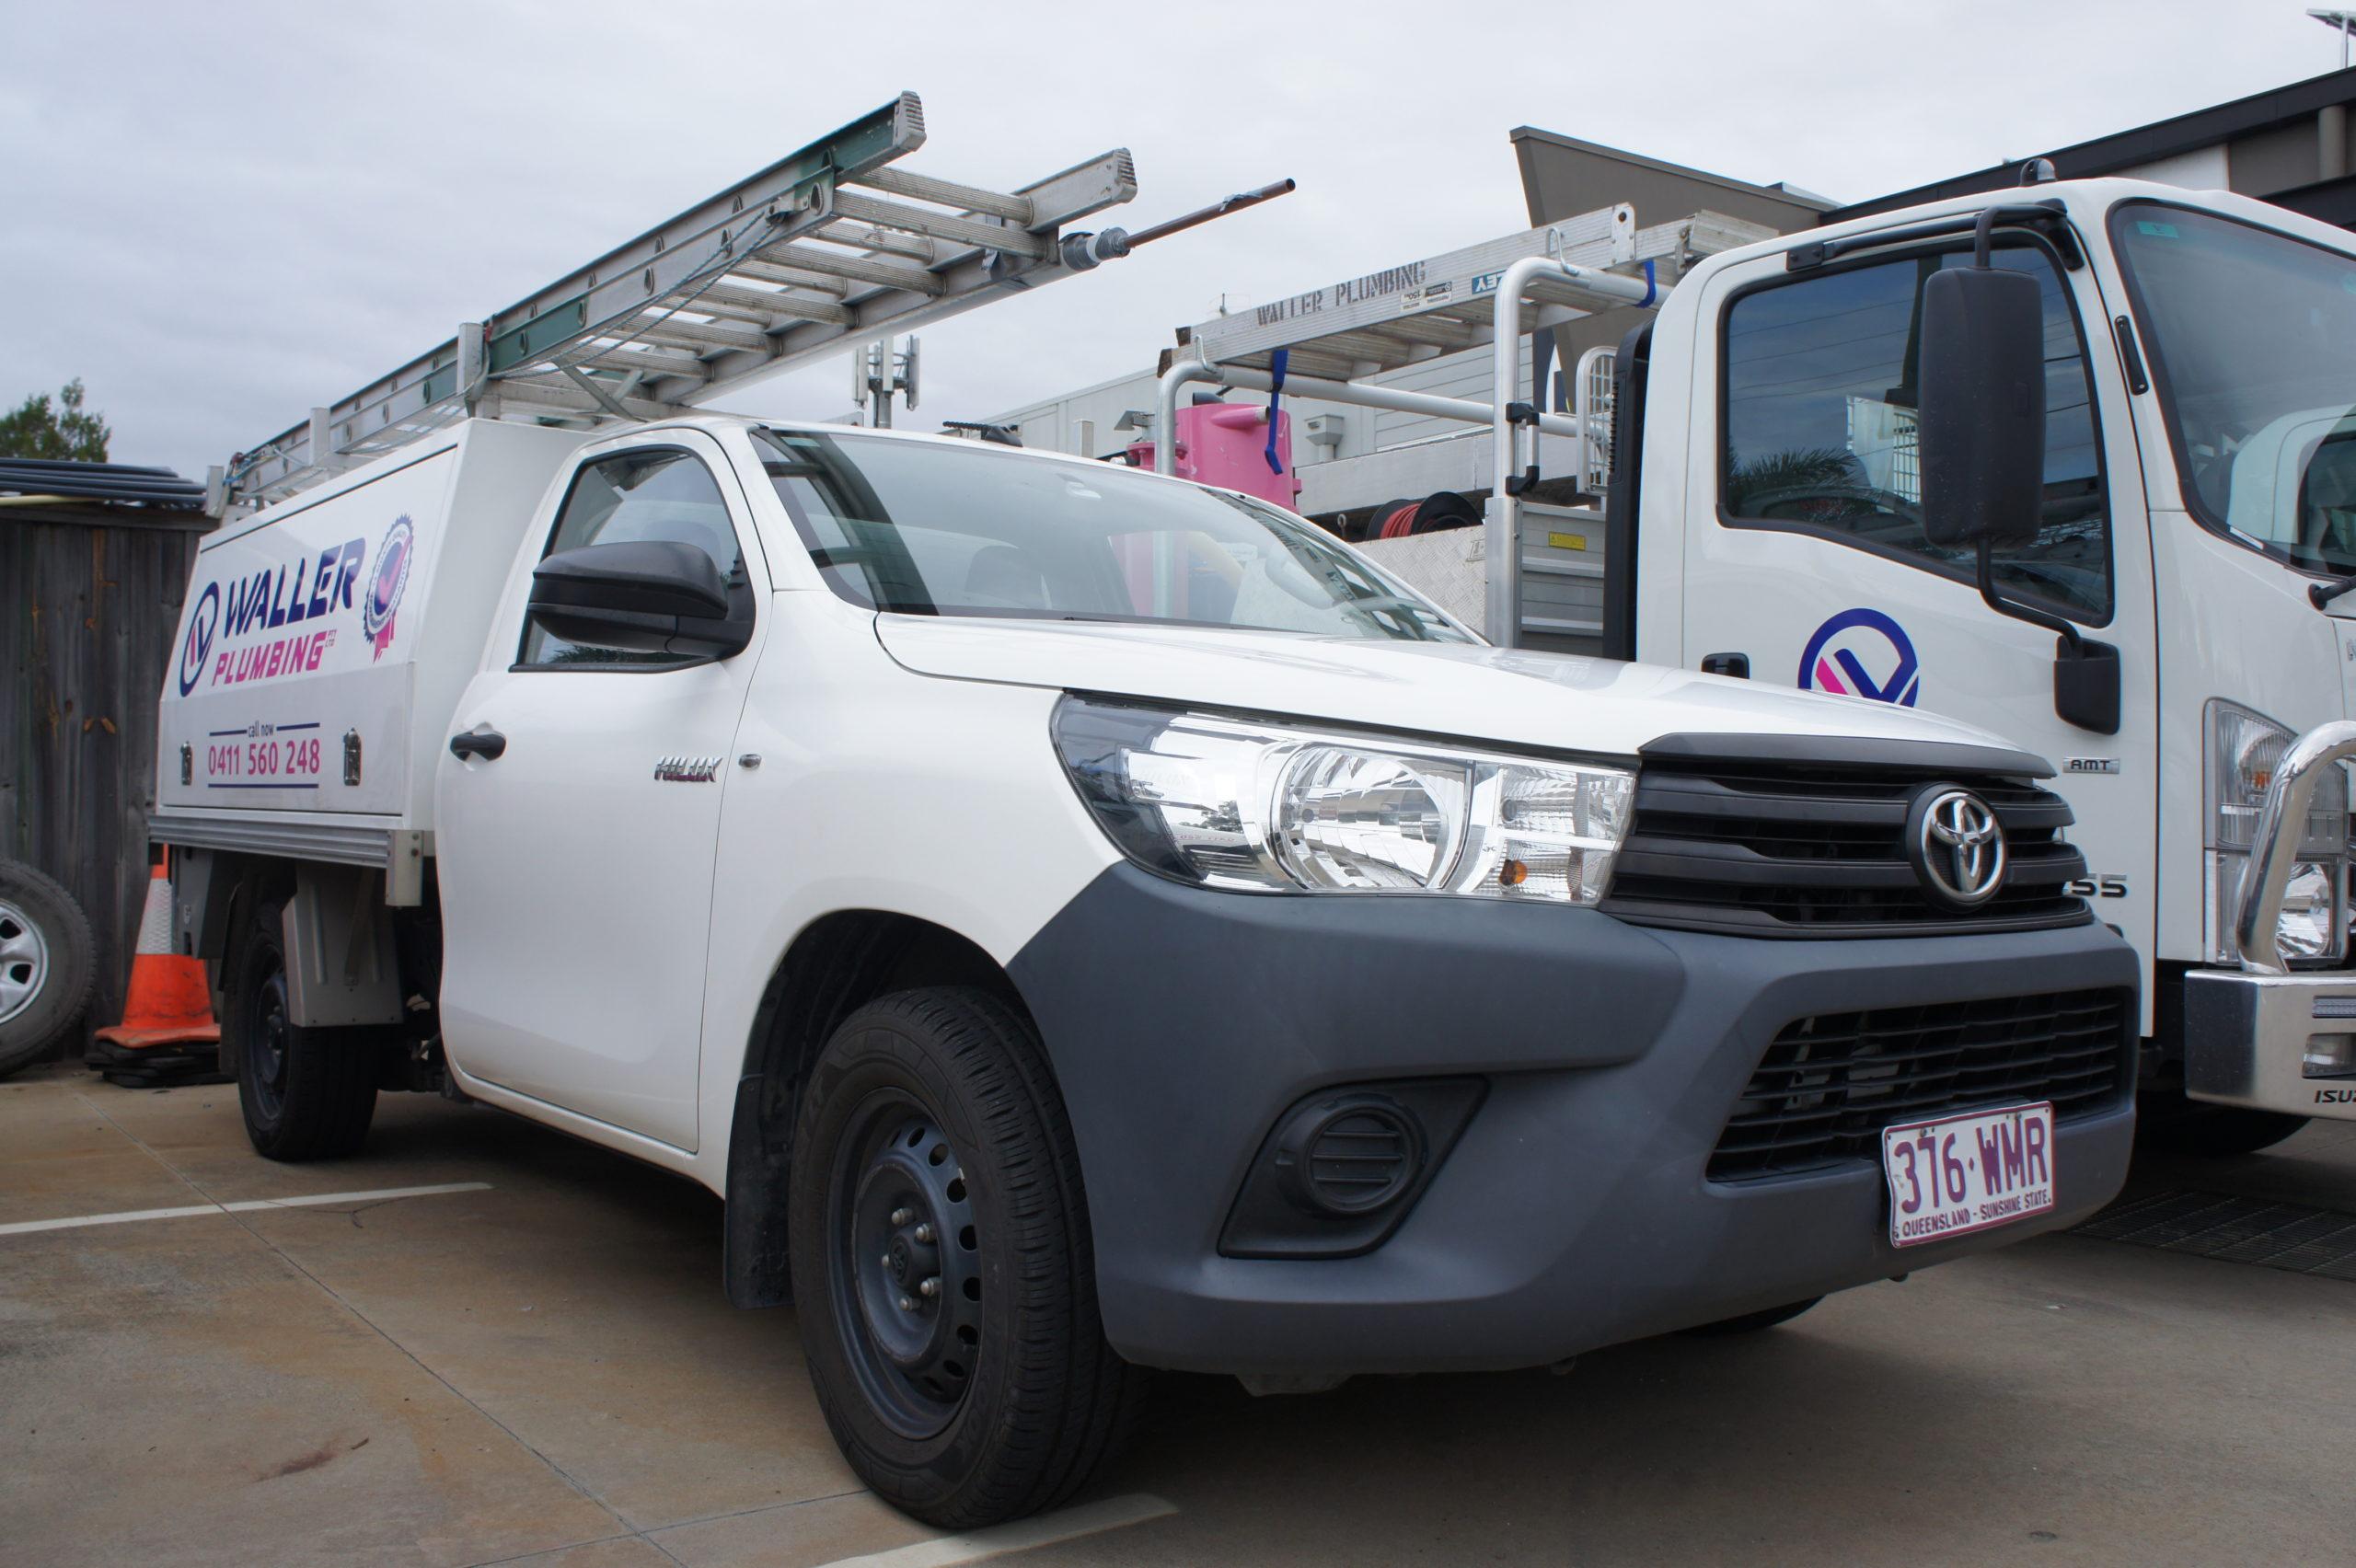 Waller Plumbing Brisbane service vehicles